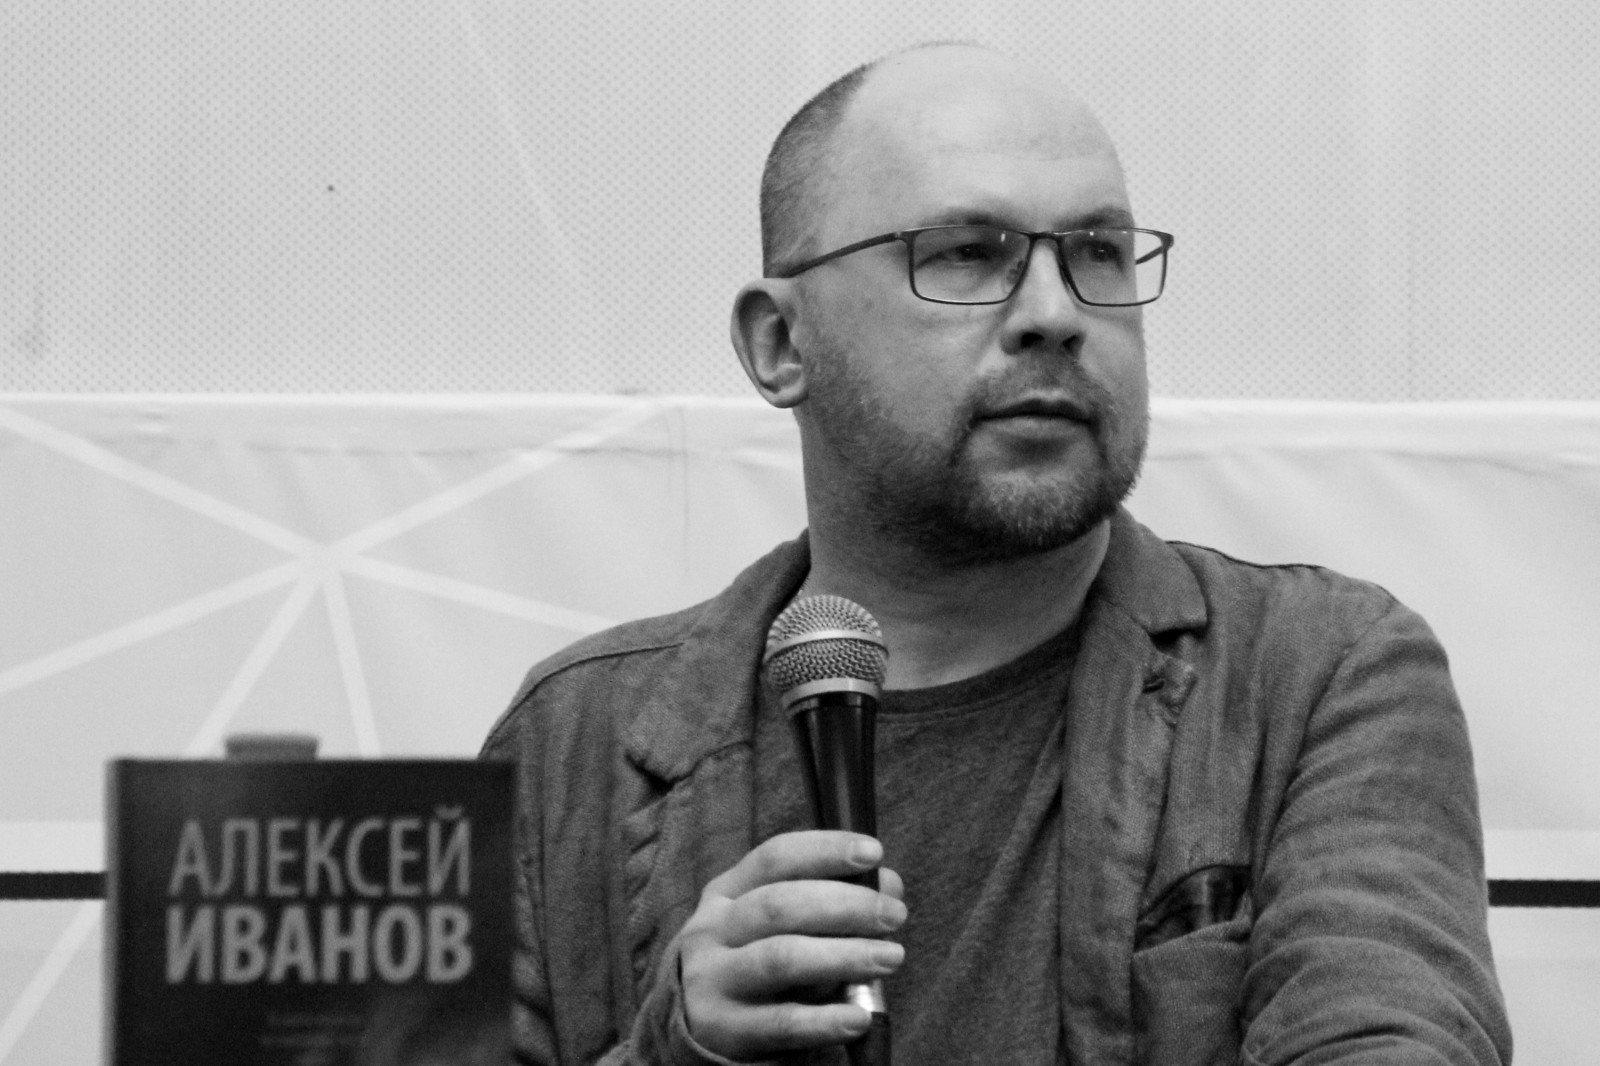 Алексей Иванов написал книгу опионерах-вампирах